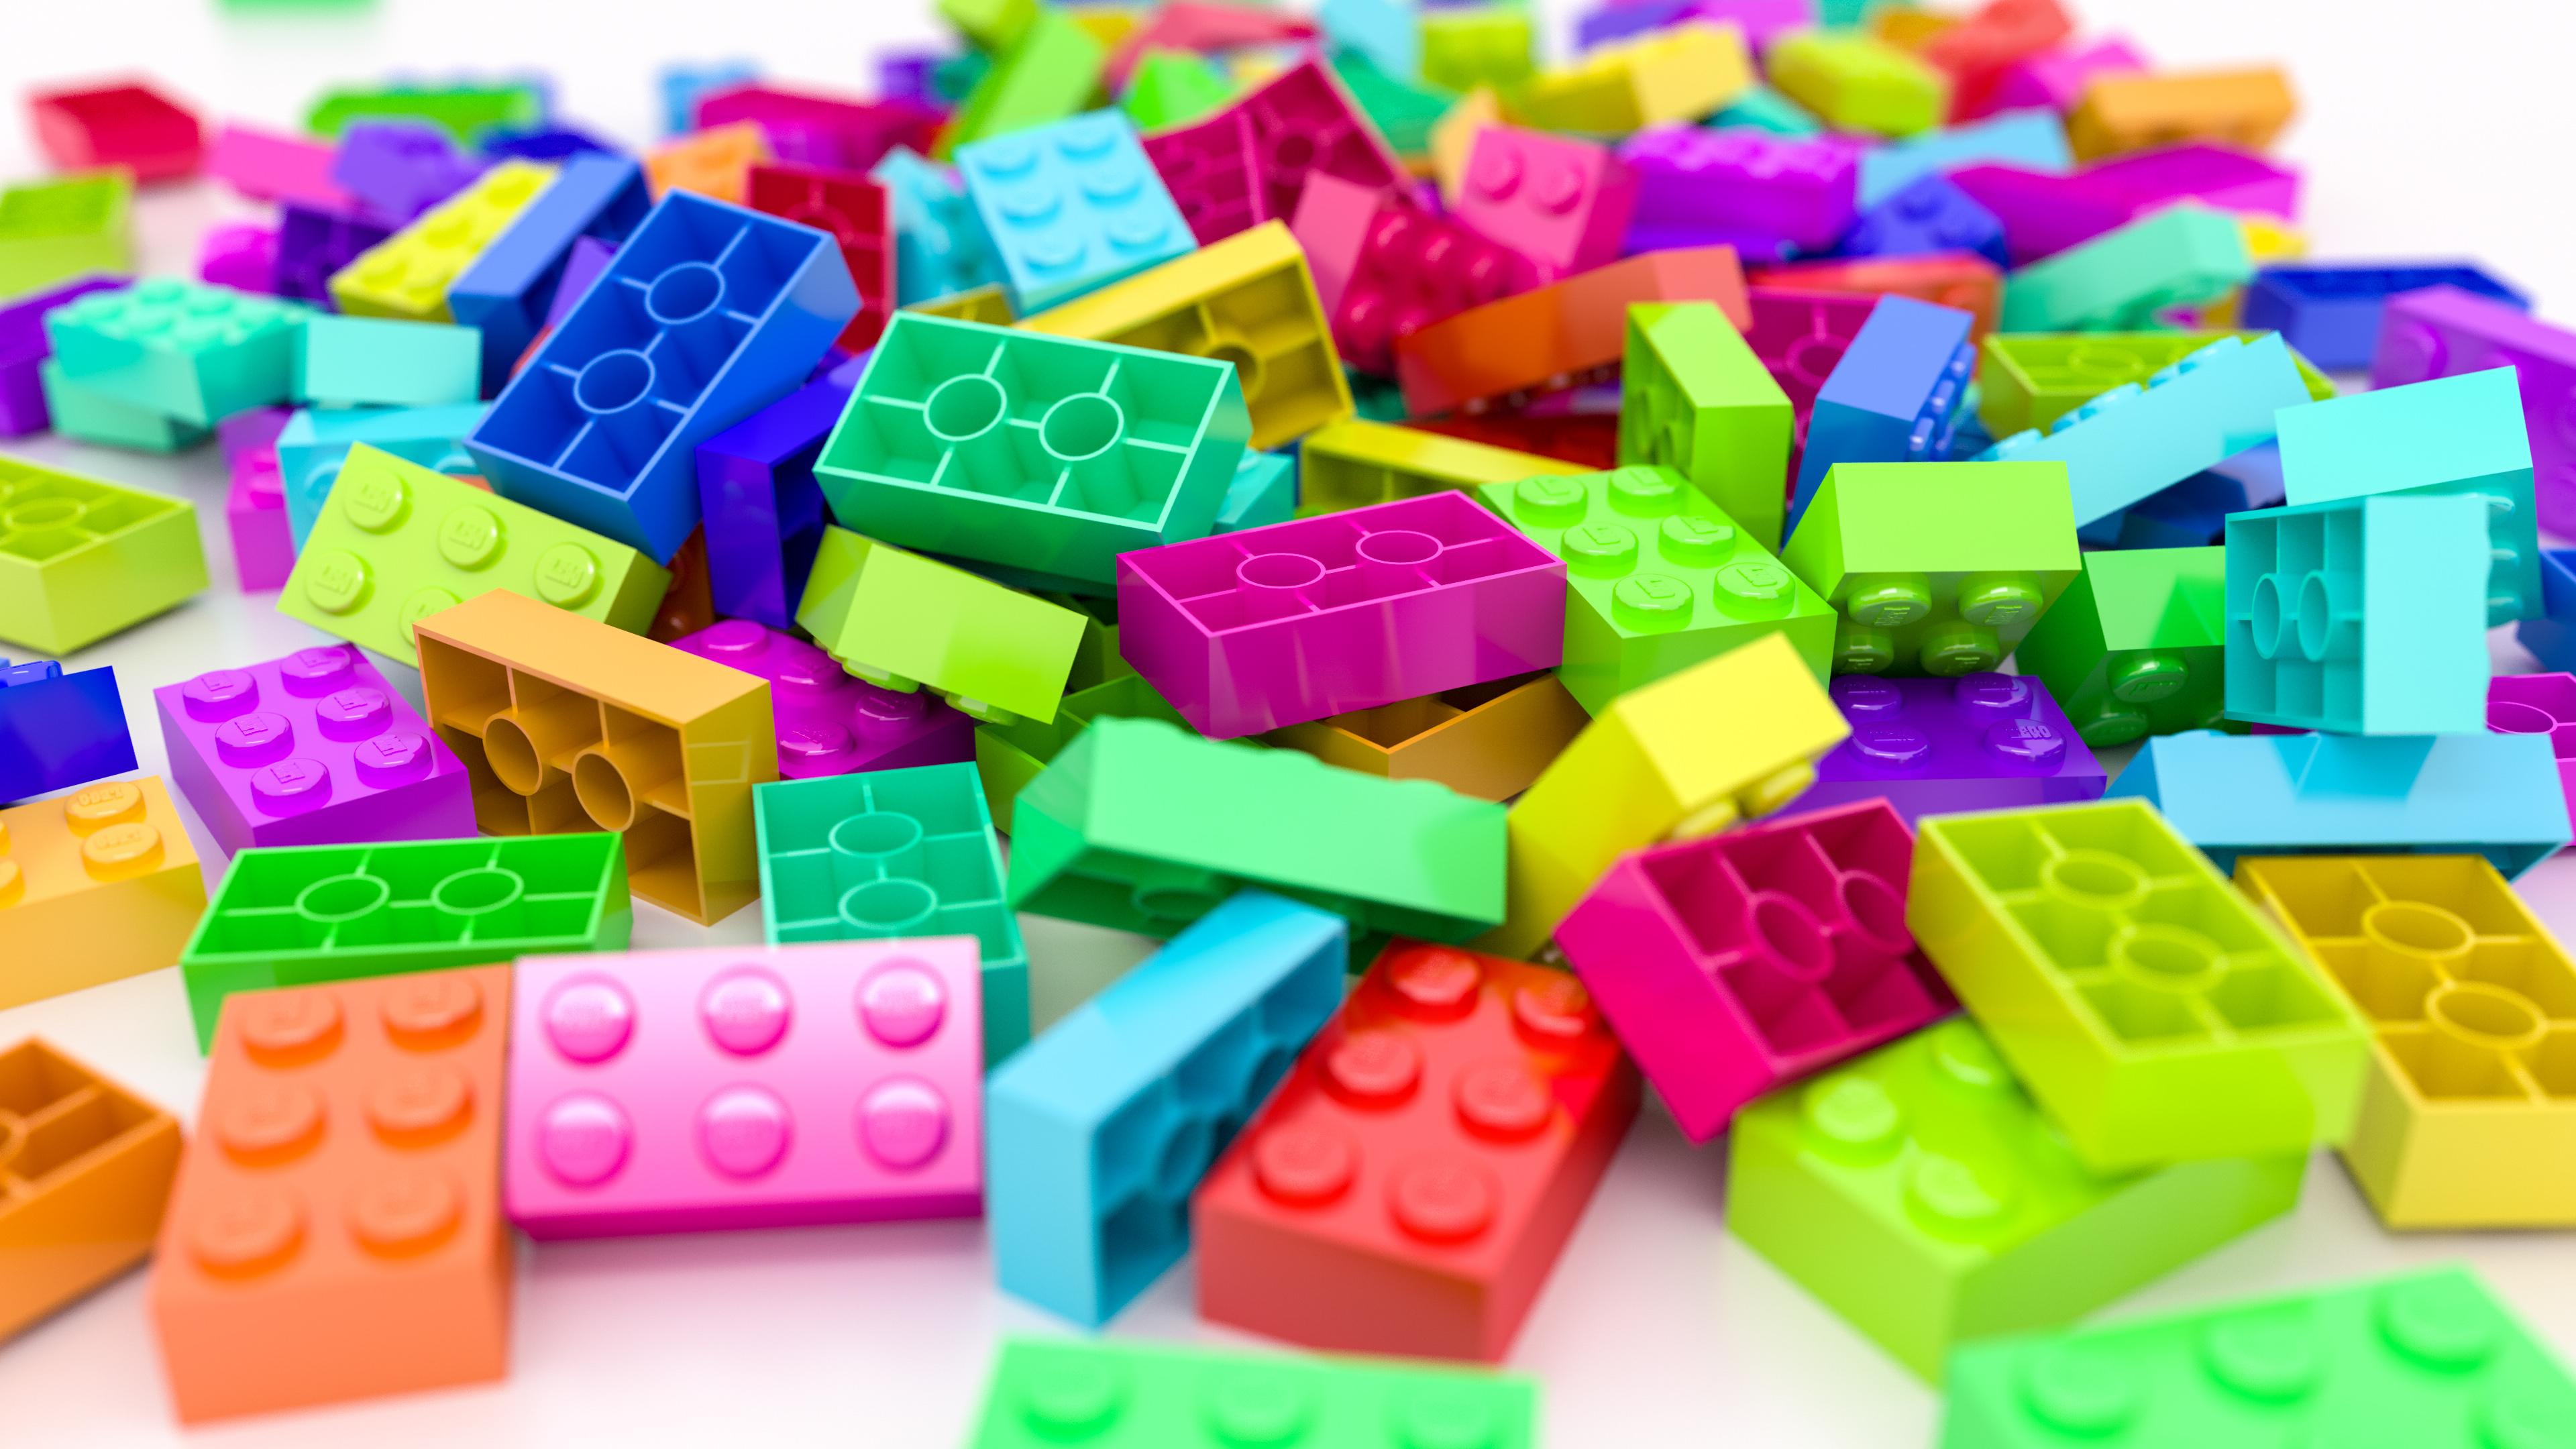 File:Lego blocks jpg - Wikimedia Commons